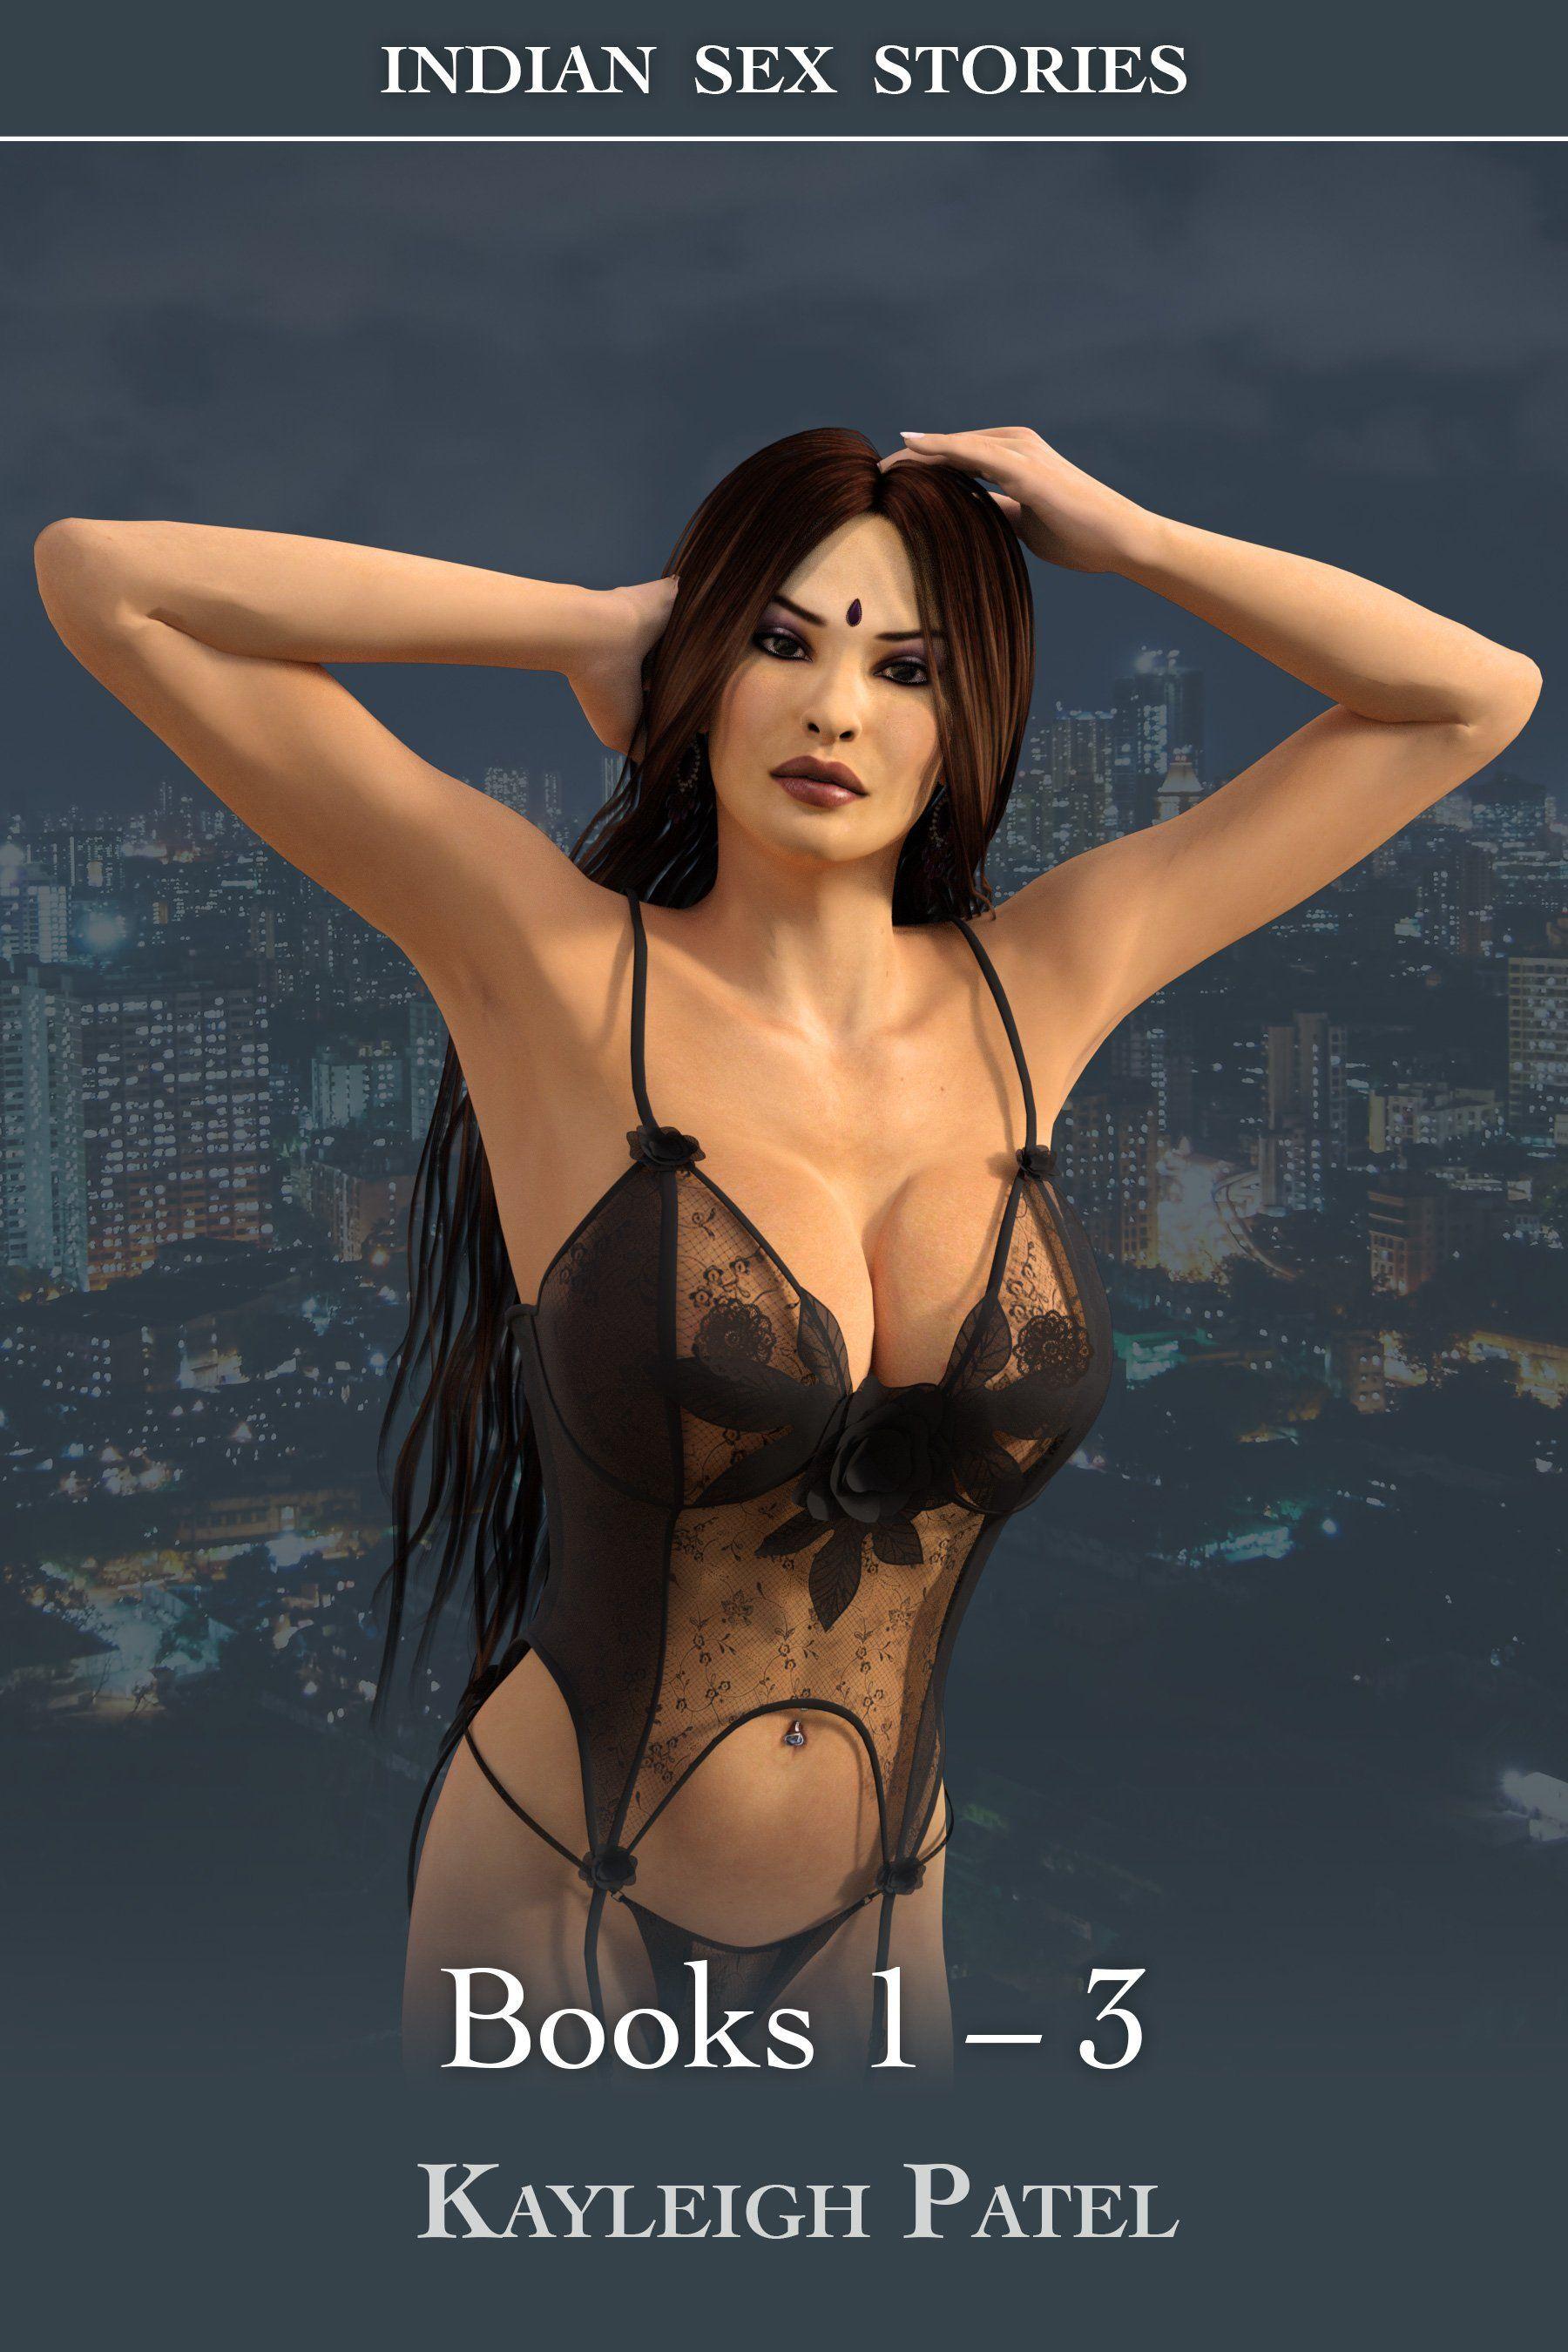 Mariah milano penthouse